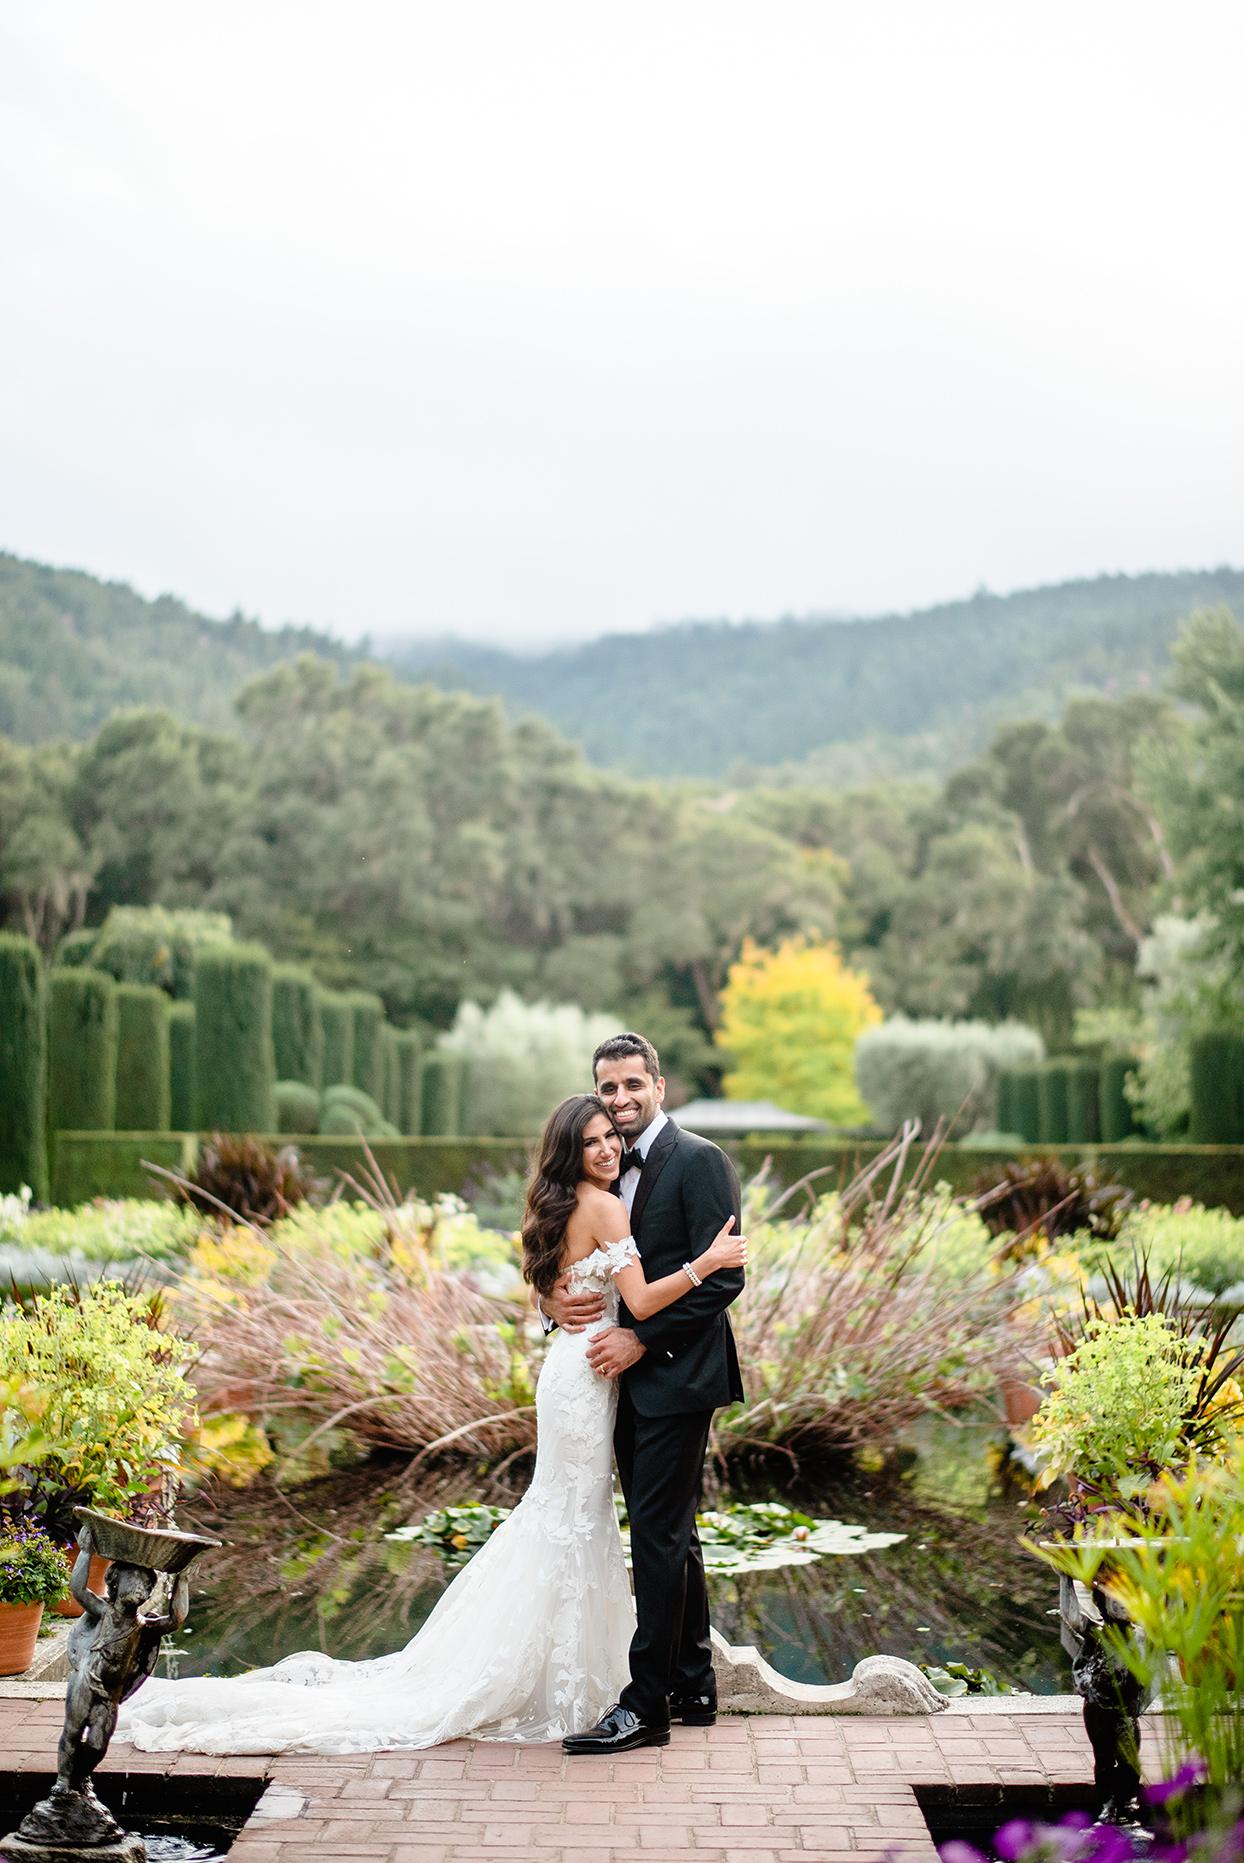 yalda anusha wedding couple portrait in garden venue overlooking hills